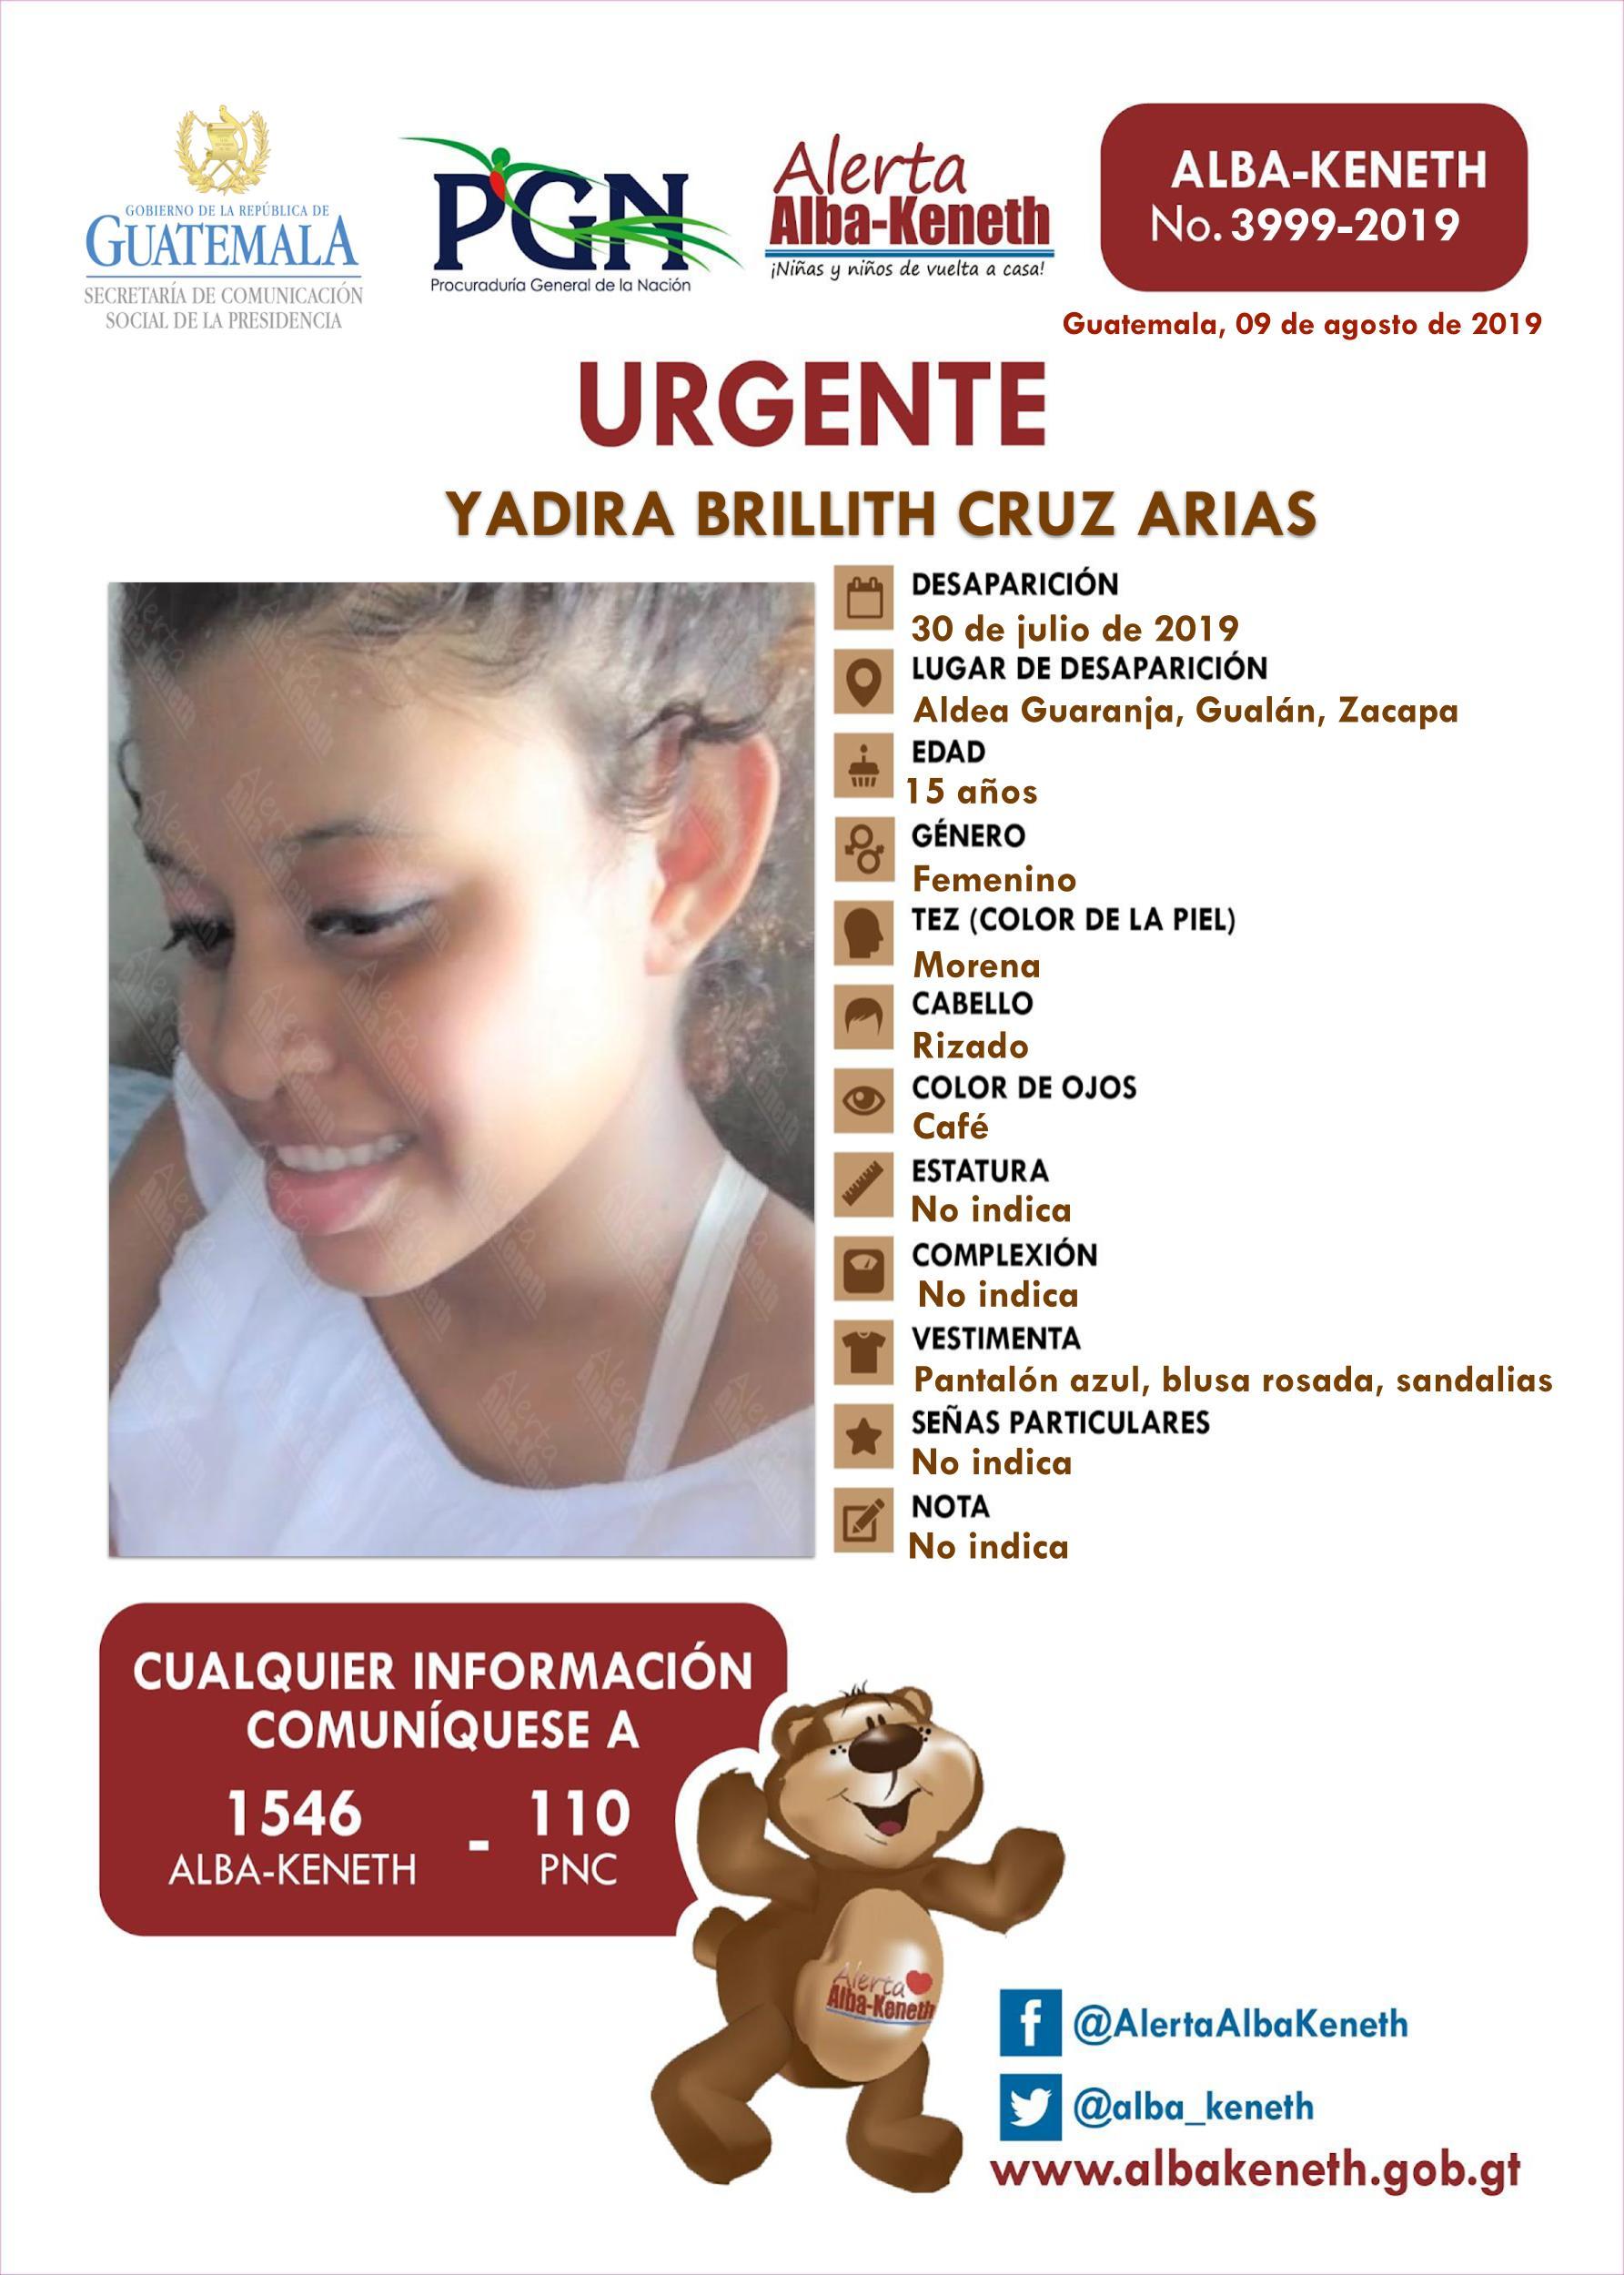 Yadira Brillith Cruz Arias